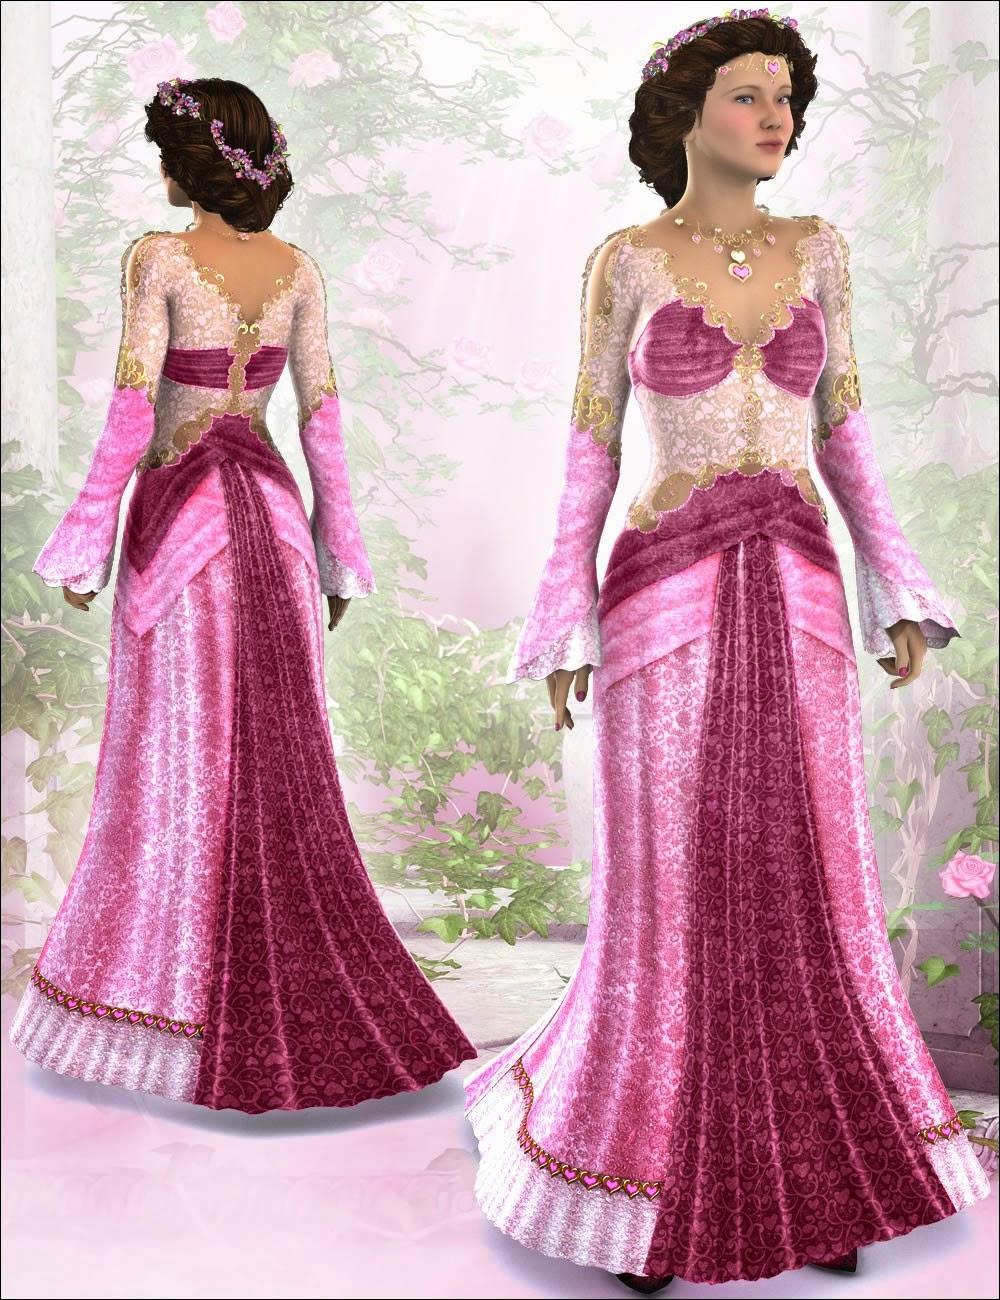 Princess of Romance